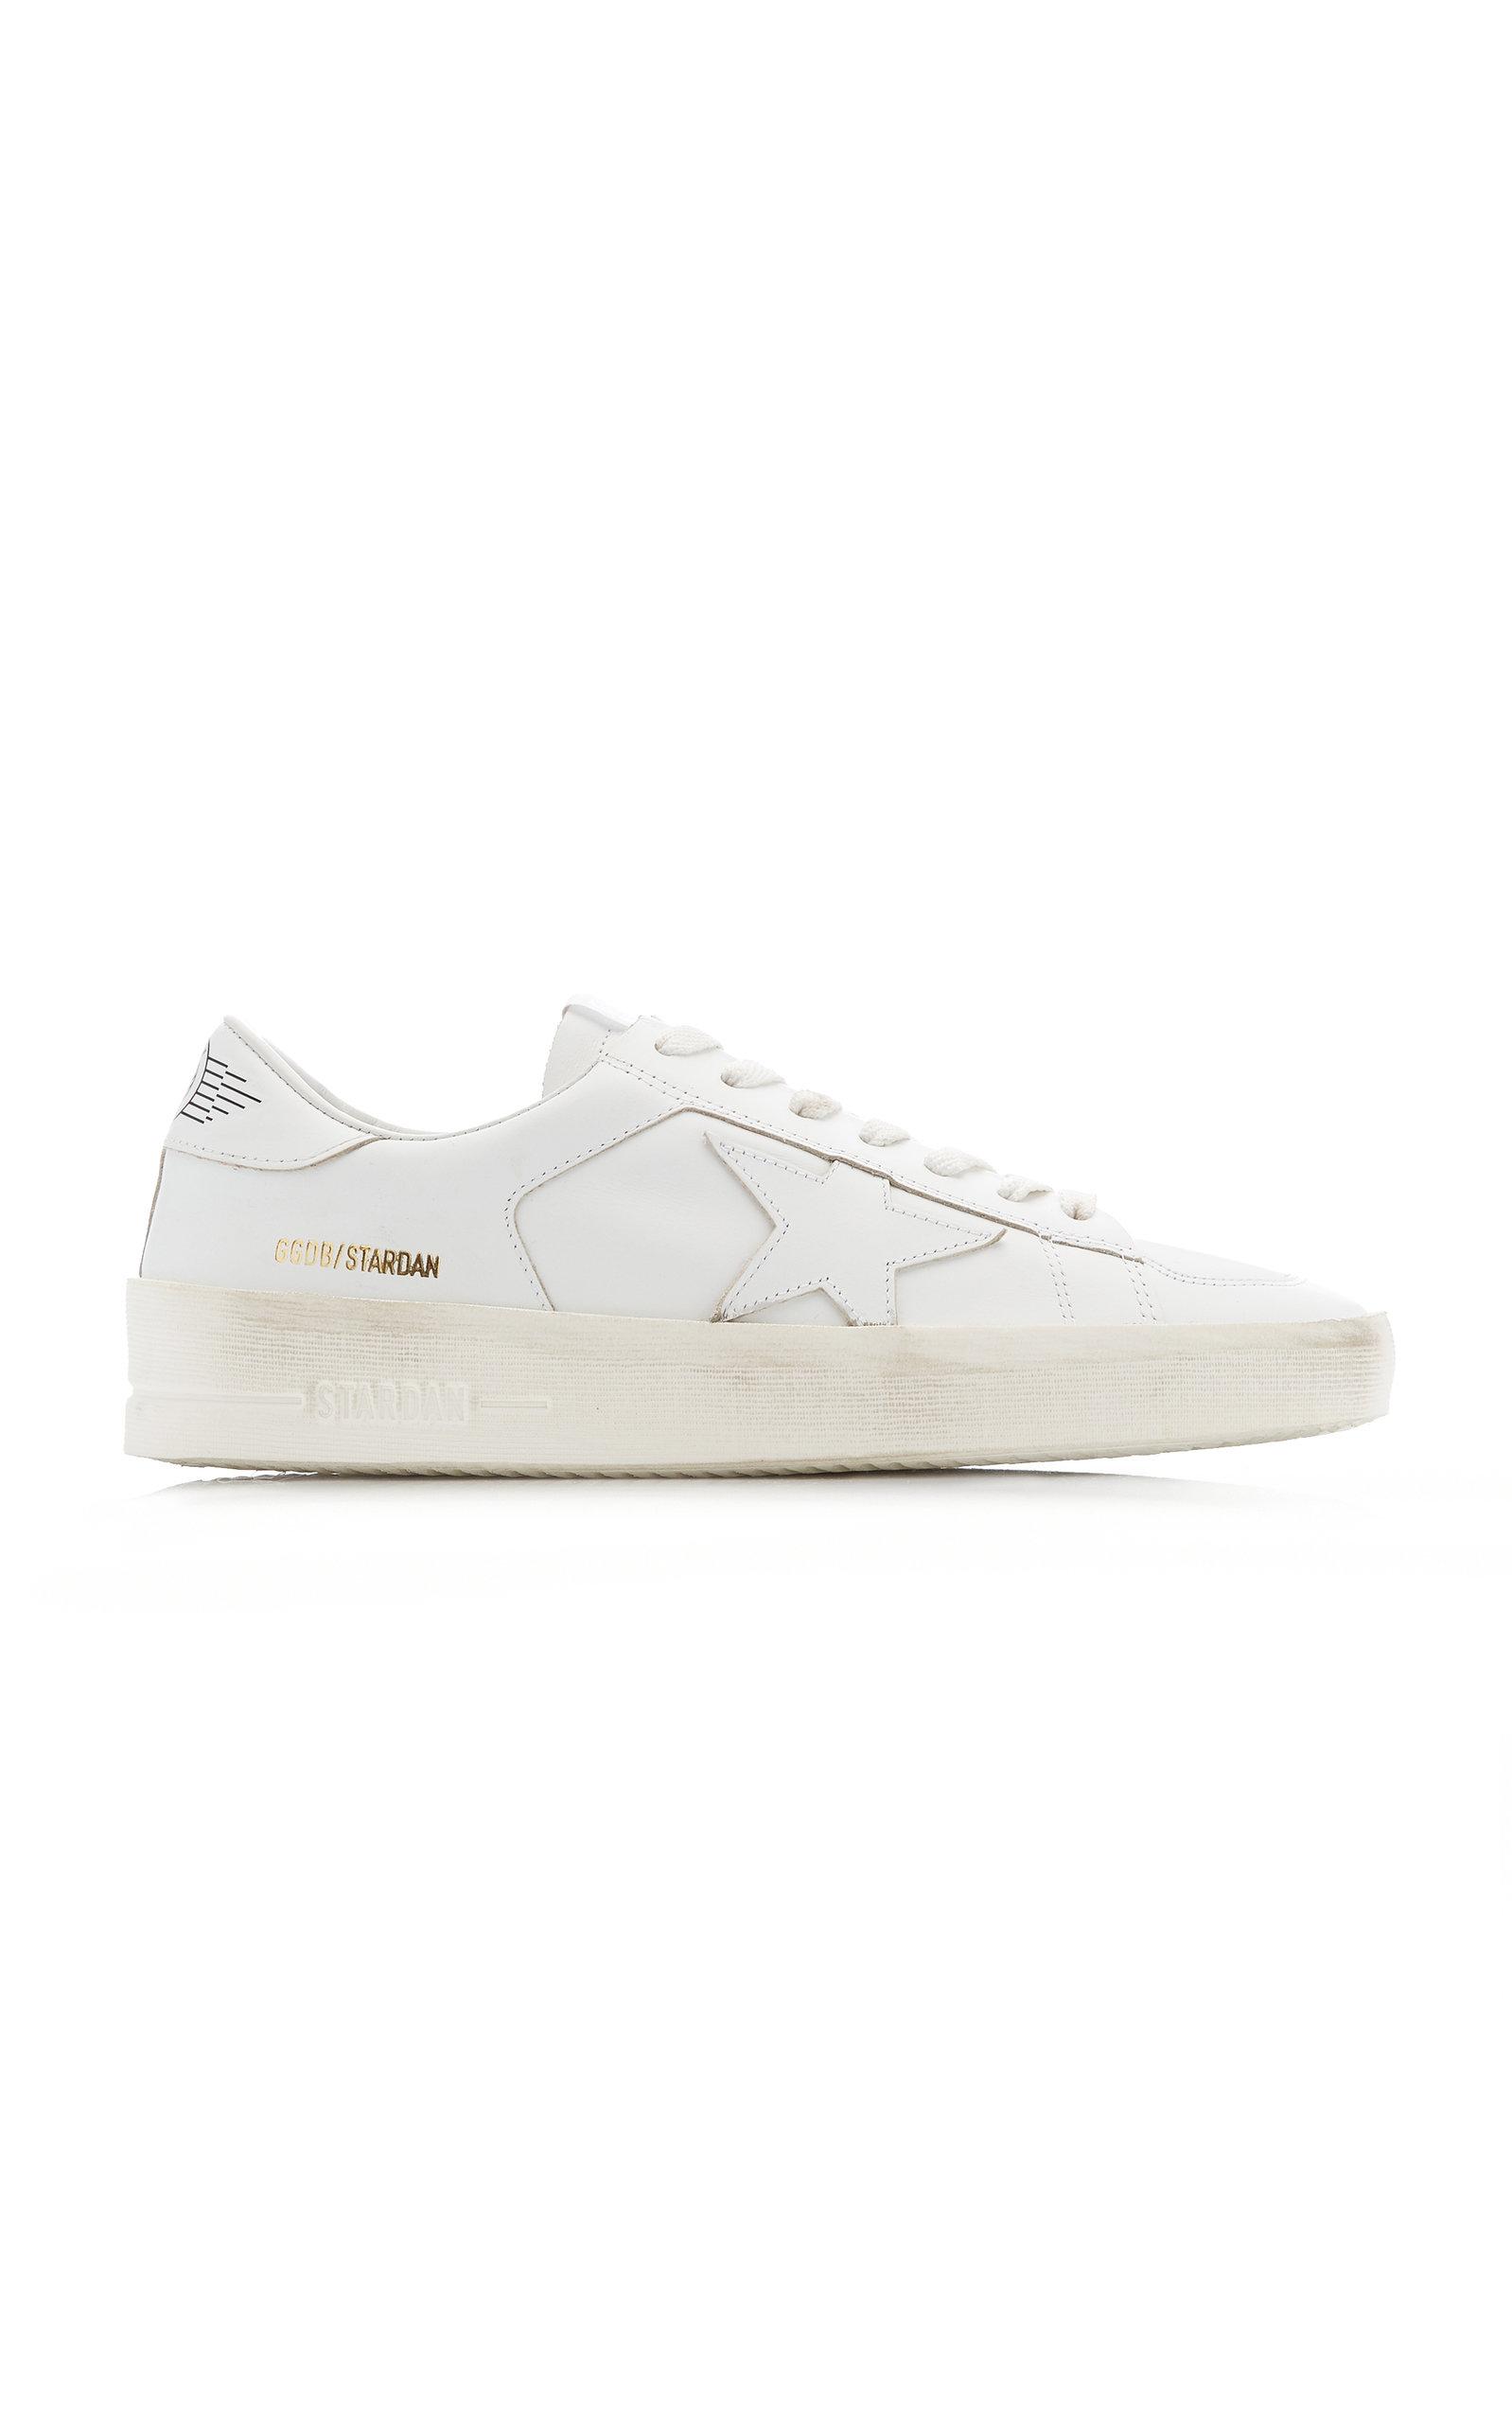 Golden Goose - Women's Stardan Leather Sneakers  - White - Moda Operandi